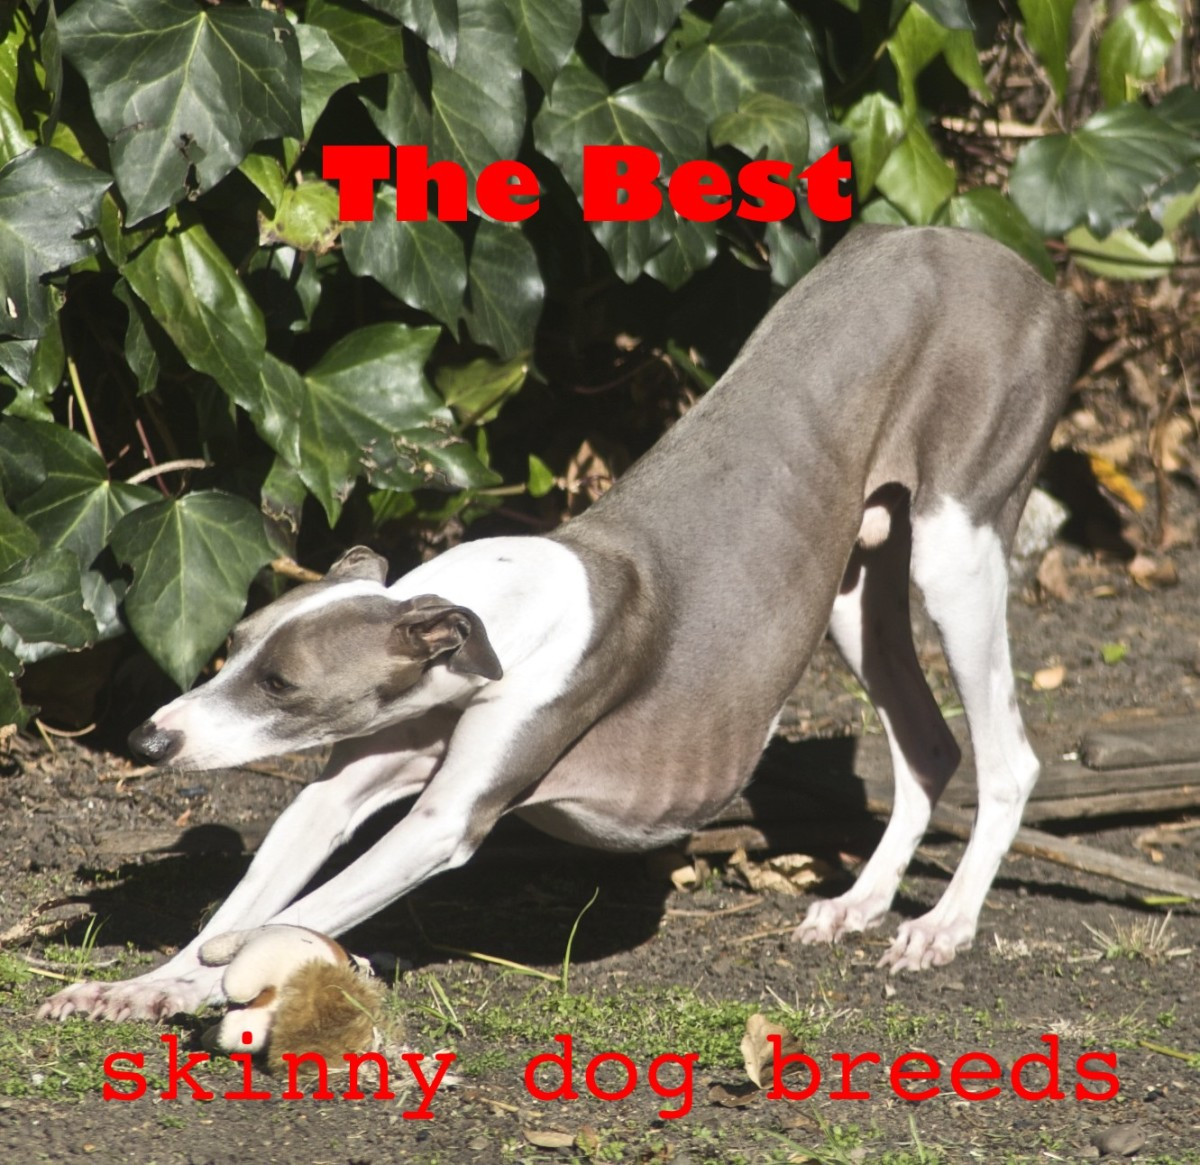 The best skinny dog breeds.